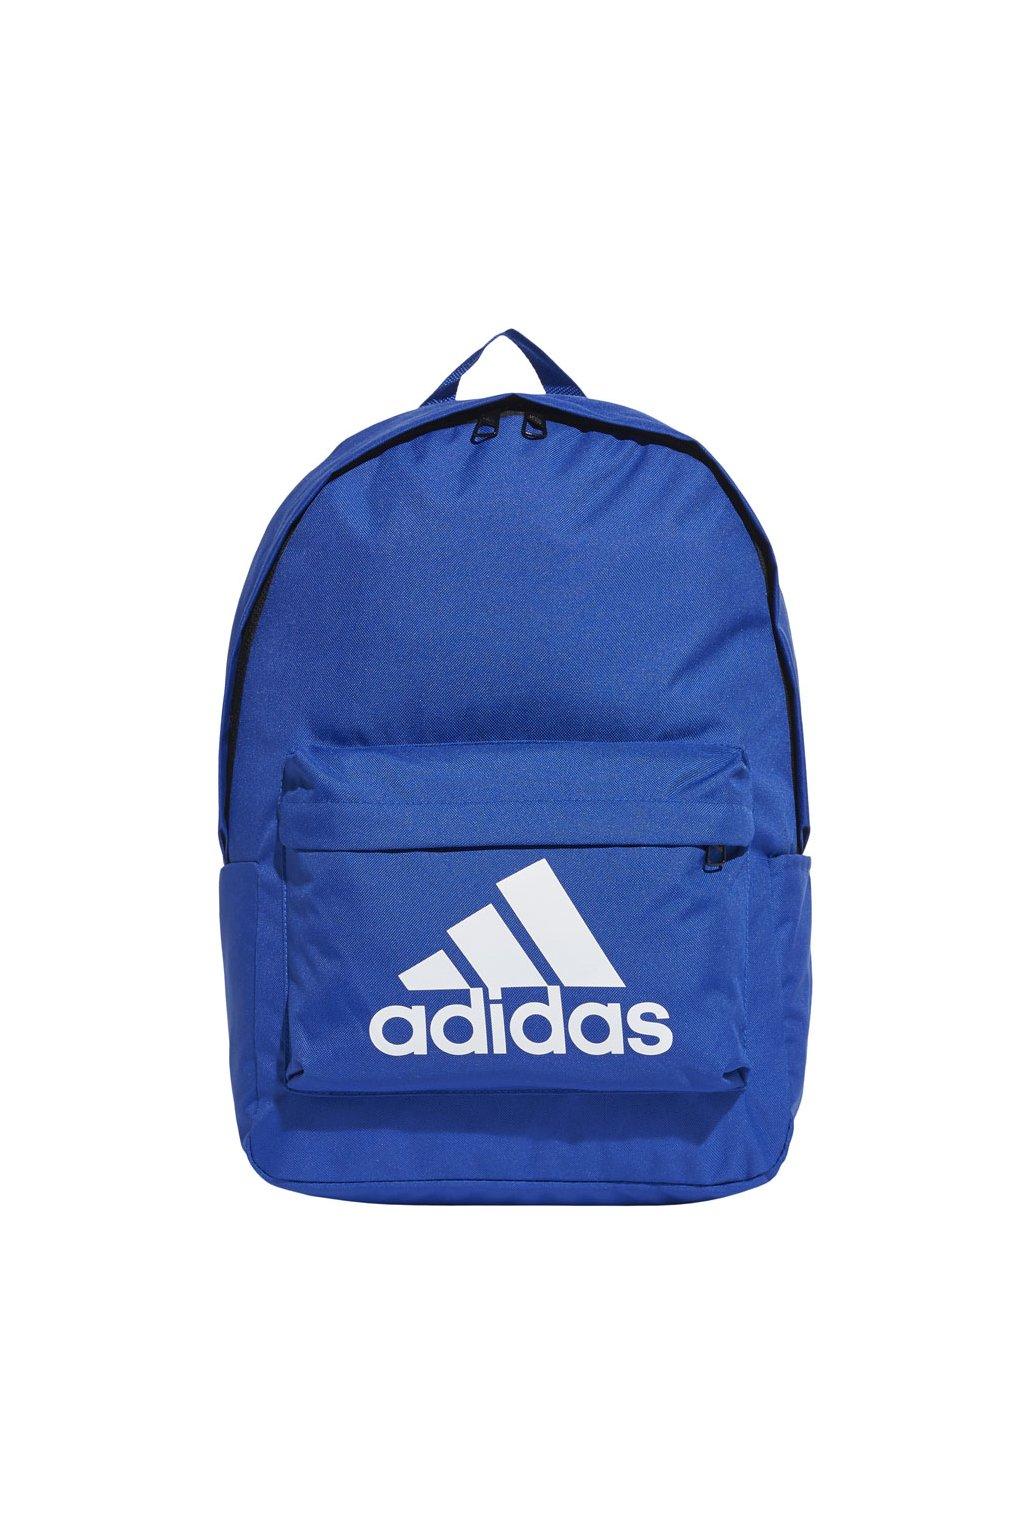 Batoh adidas Classic Backpack BOS modrý GD5622